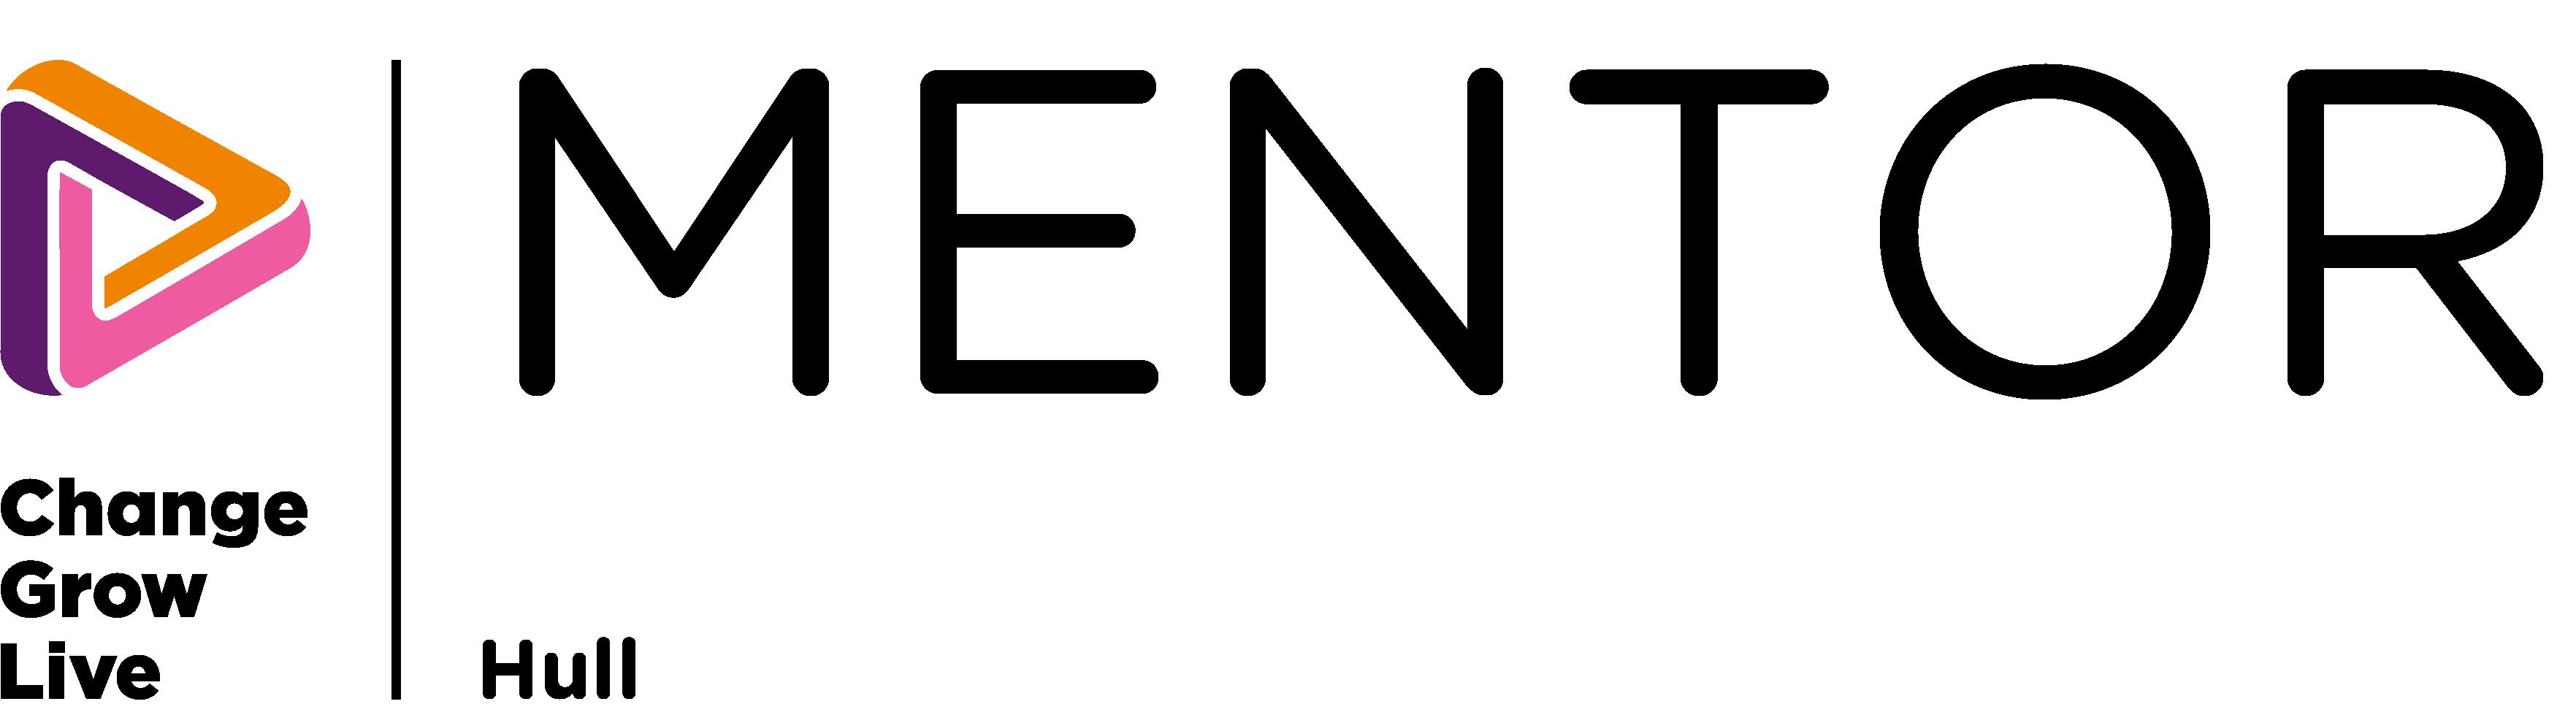 Colour_Black text_MENTOR Hull logo